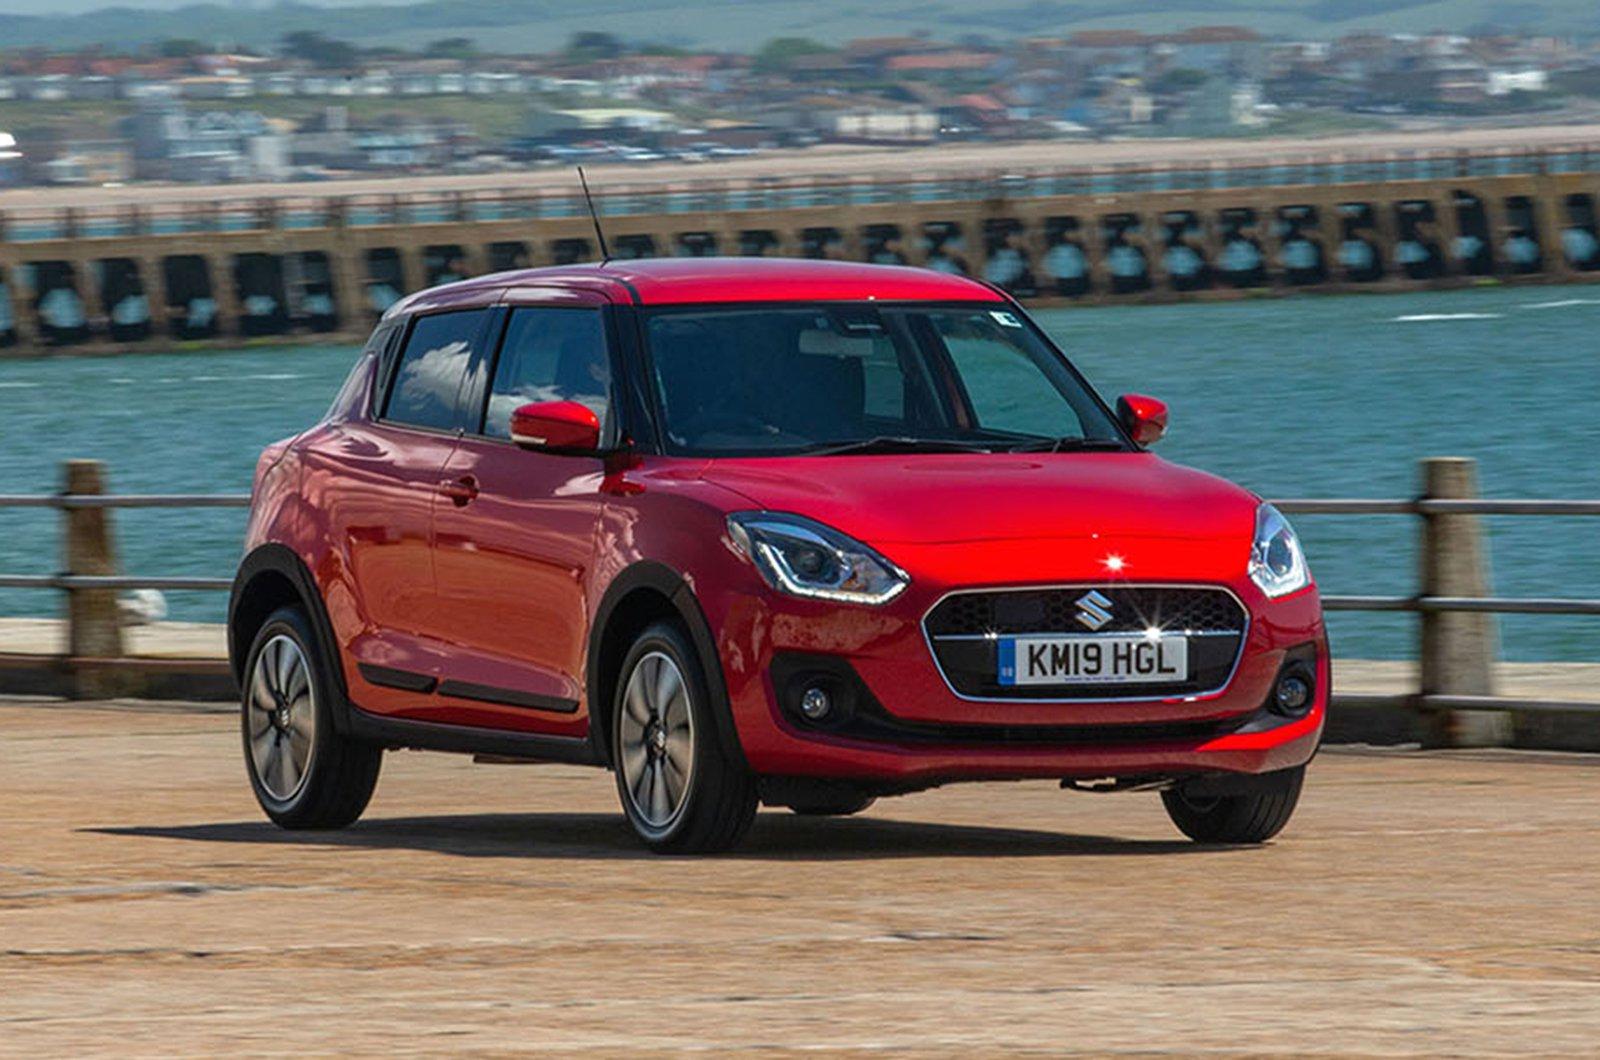 2019 Suzuki Swift SHVS 4x4 review